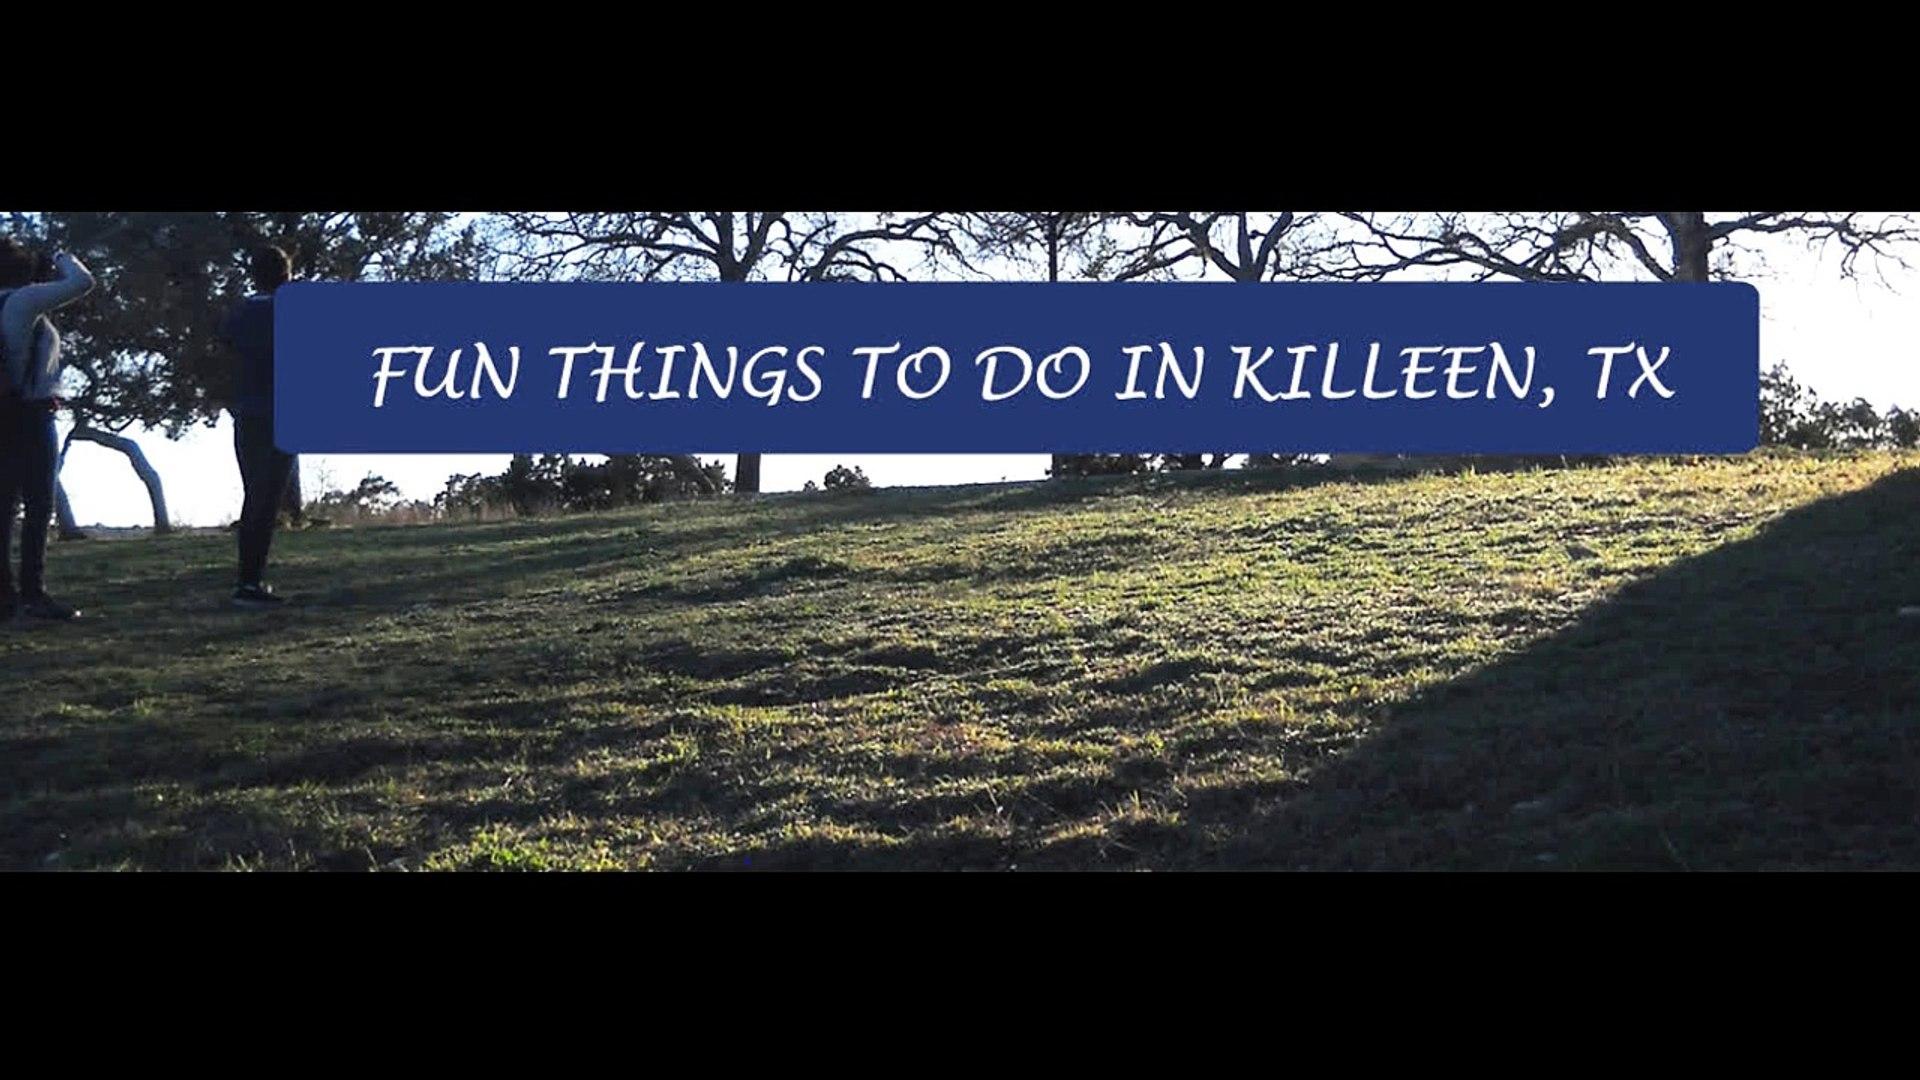 Fun Things To Do In Killeen, TX